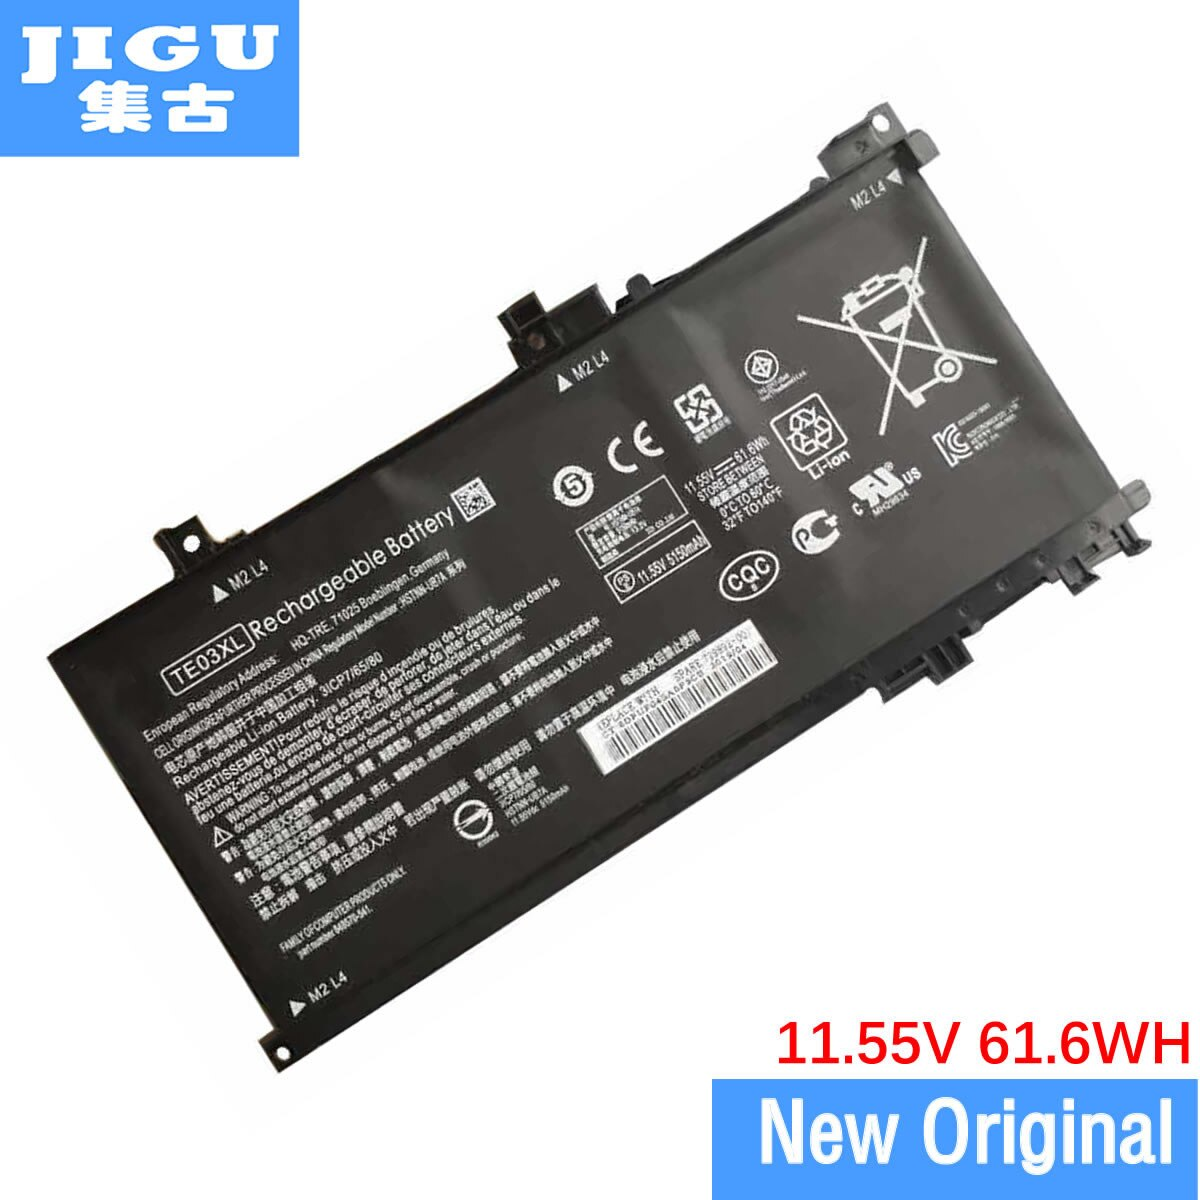 JIGU 11.55V 61.6WH TE03061XL TE03XL 849910-850 الأصلي بطارية كمبيوتر محمول ل HP 15-AX000NA 15-AX003NJ 15-AX004NB 15-AX002NI